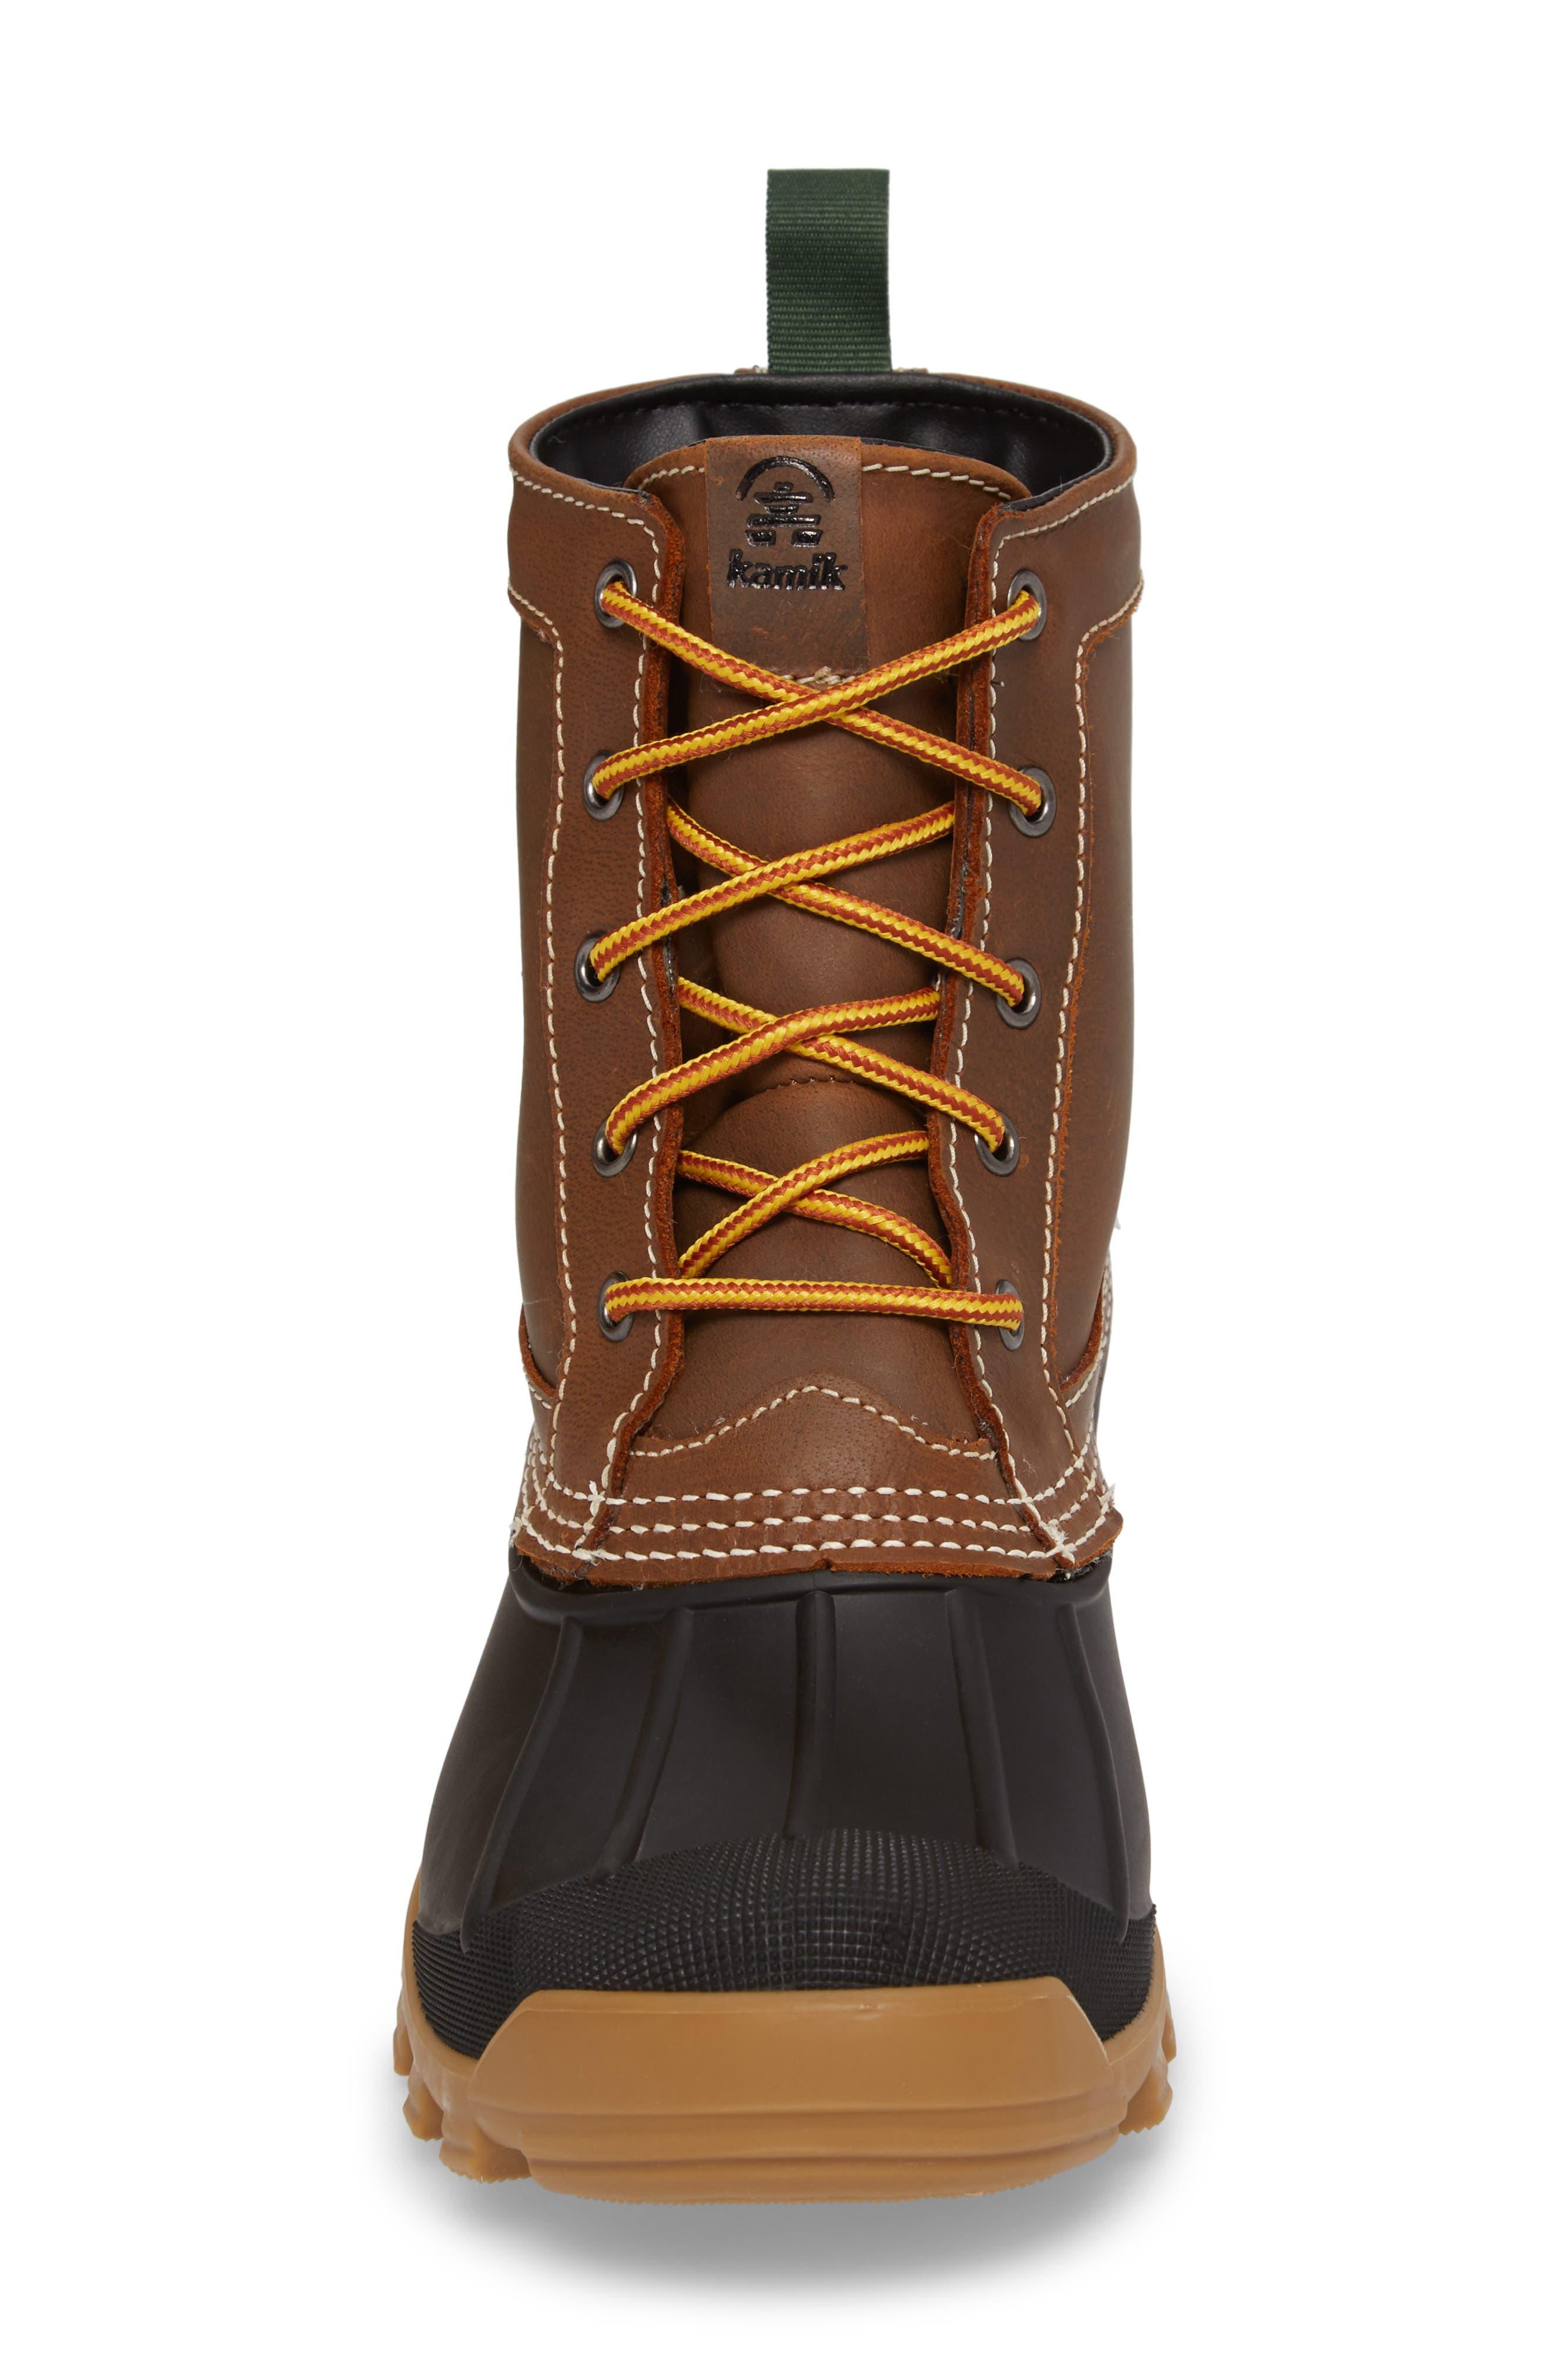 Yukon 5 Waterproof Insulated Three-Season Boot,                             Alternate thumbnail 4, color,                             201